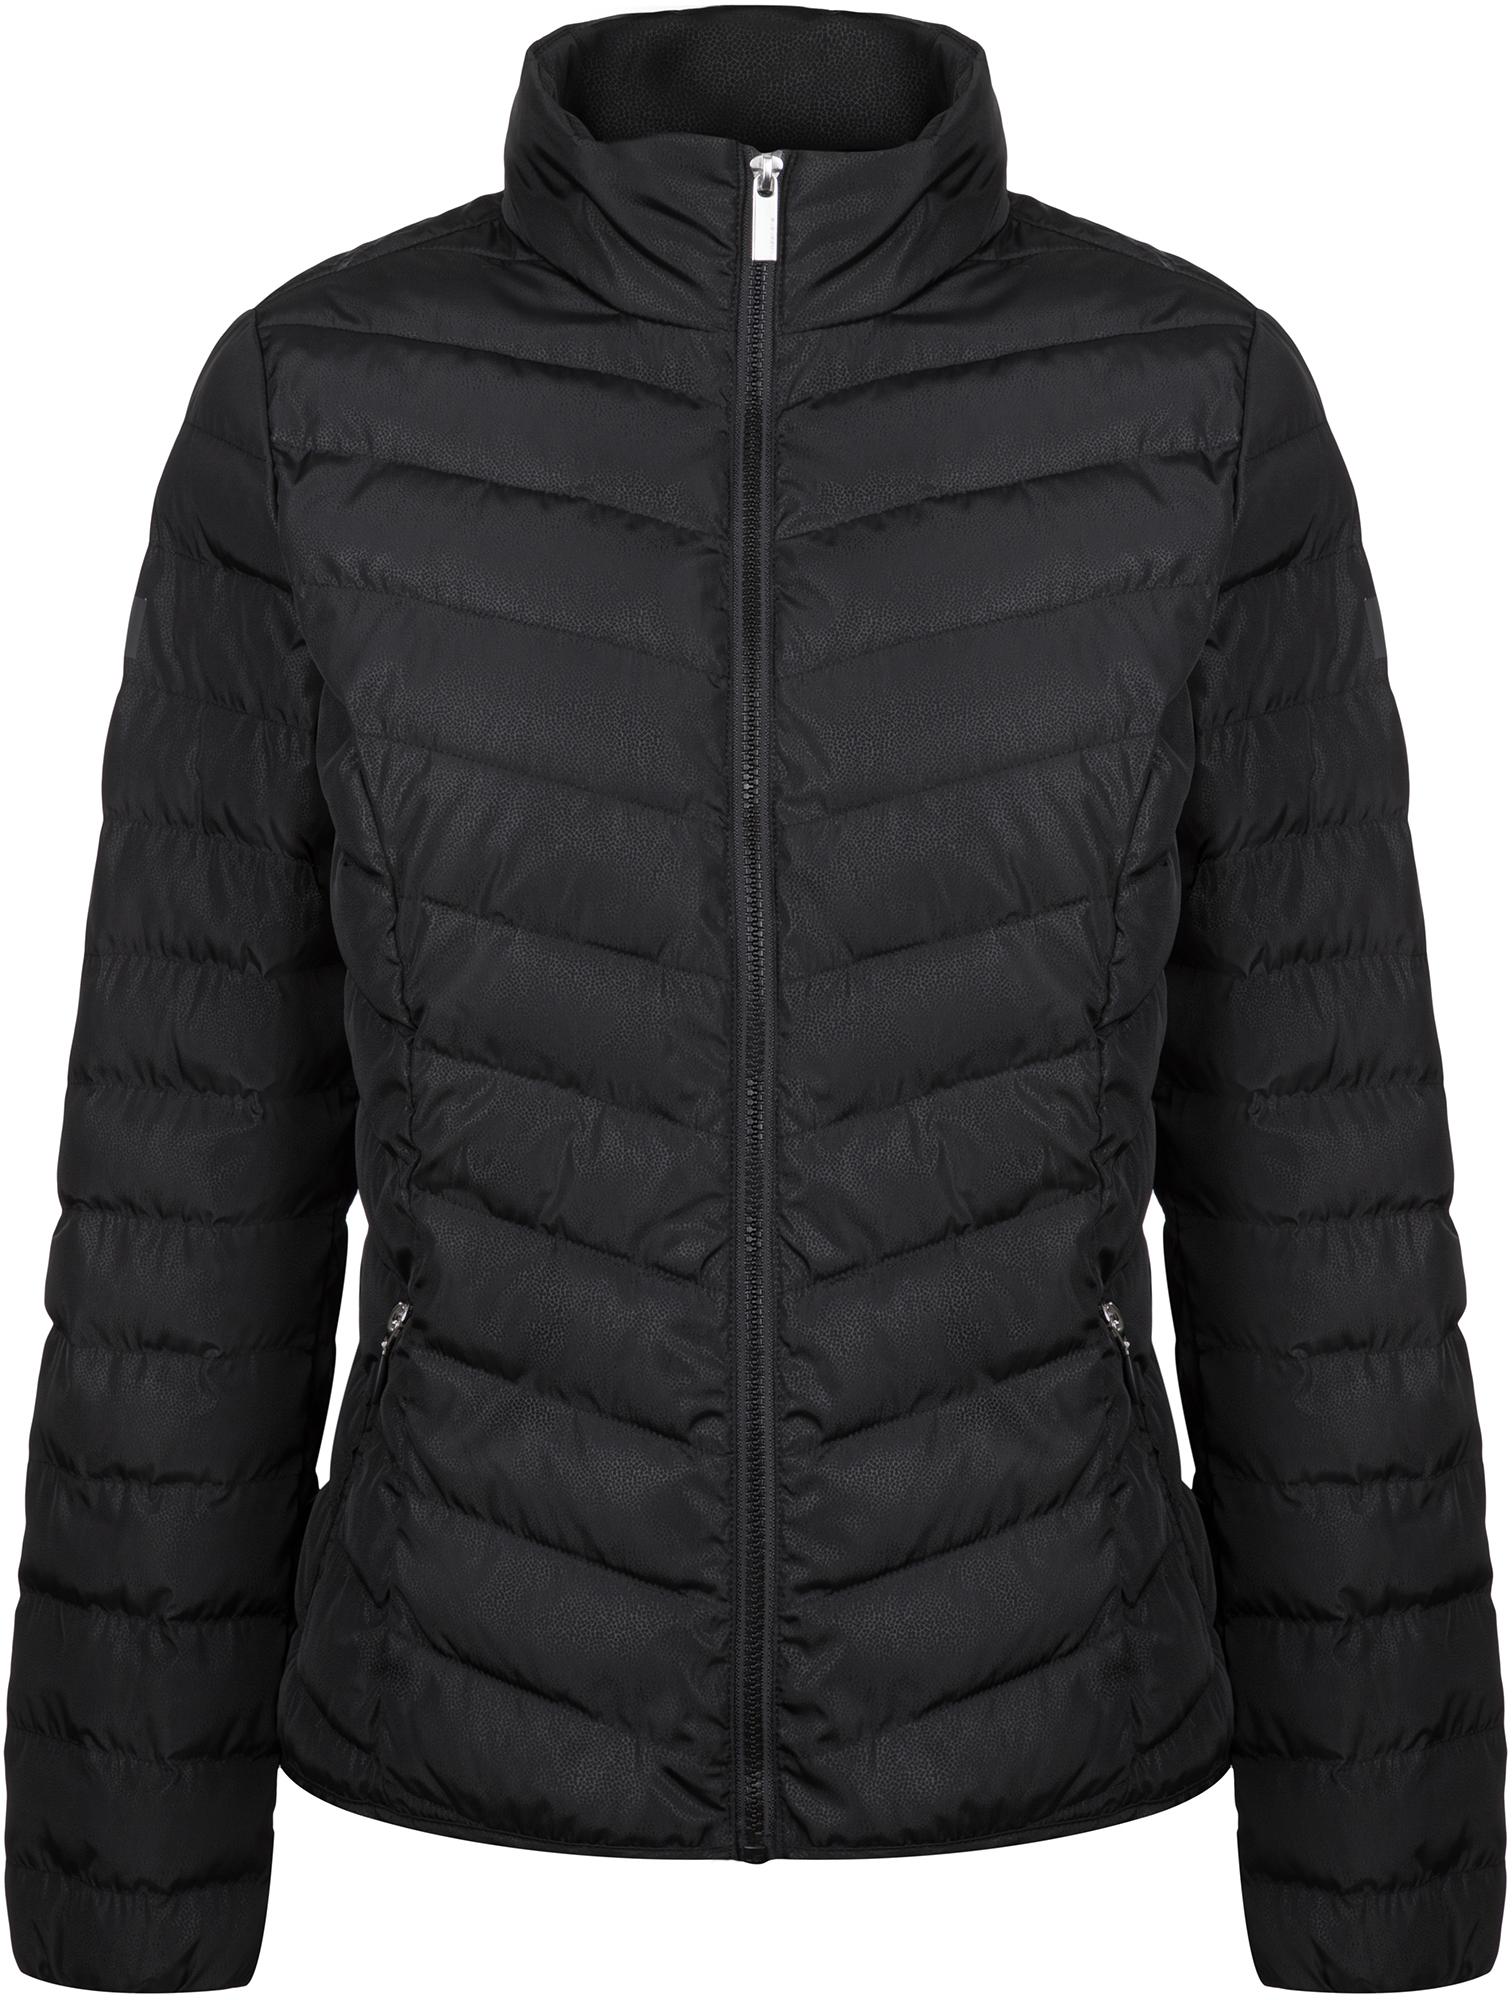 IcePeak Куртка утепленная женская IcePeak Vacha, размер 46